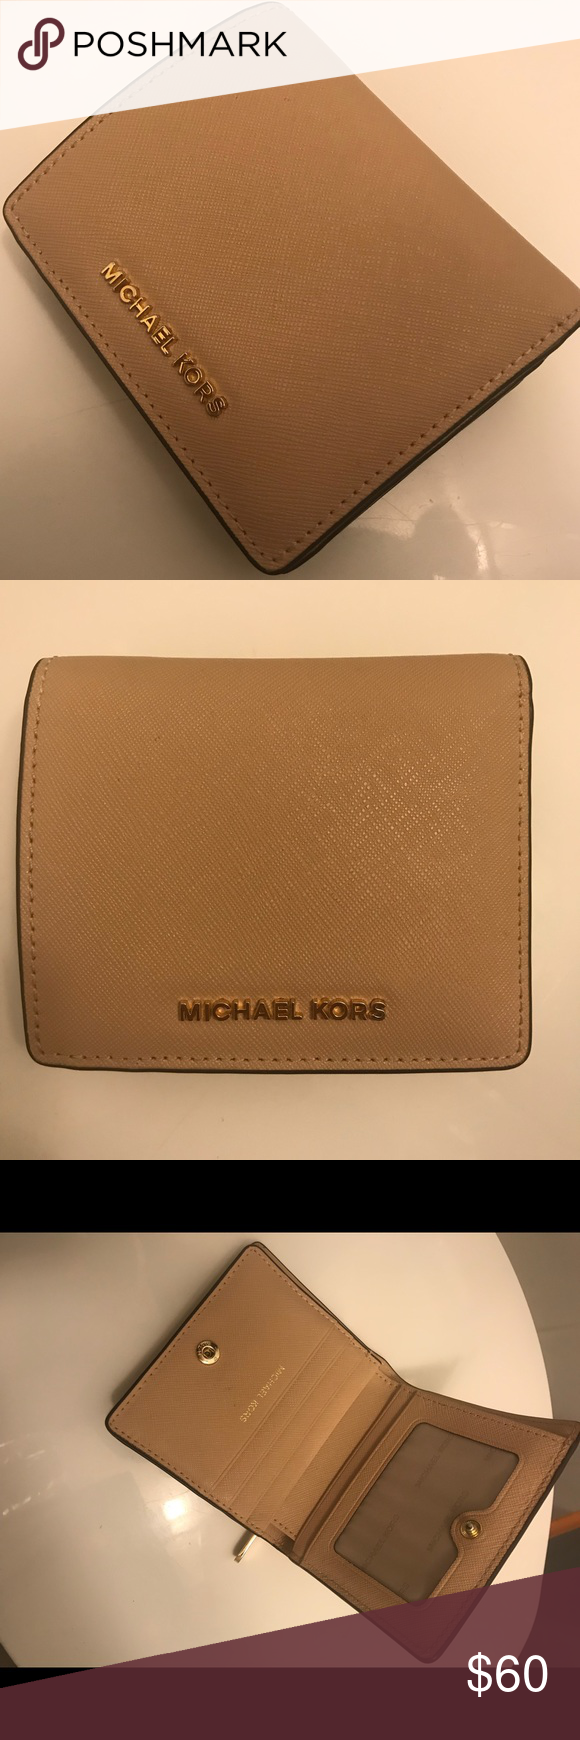 678968956b9ac Michael Kors Jet Set card wallet